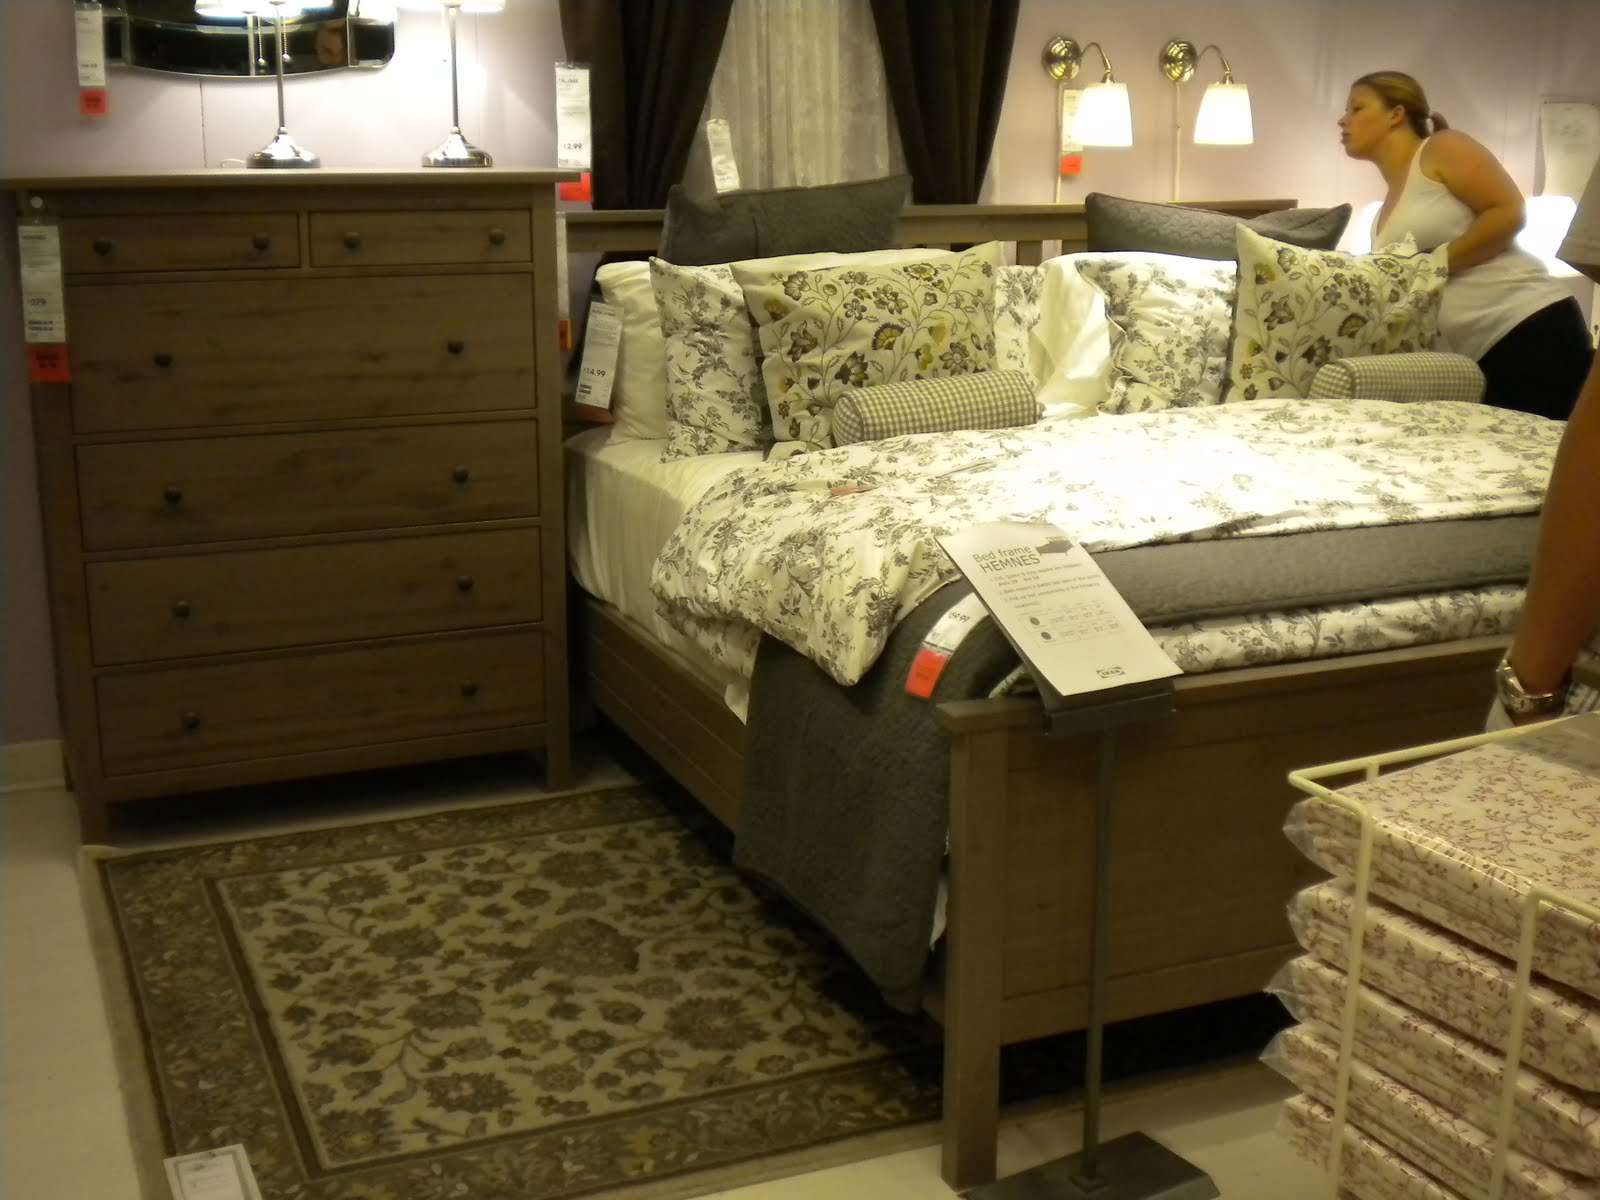 ikea-white-hemnes-bedroom-furniture-photo-14